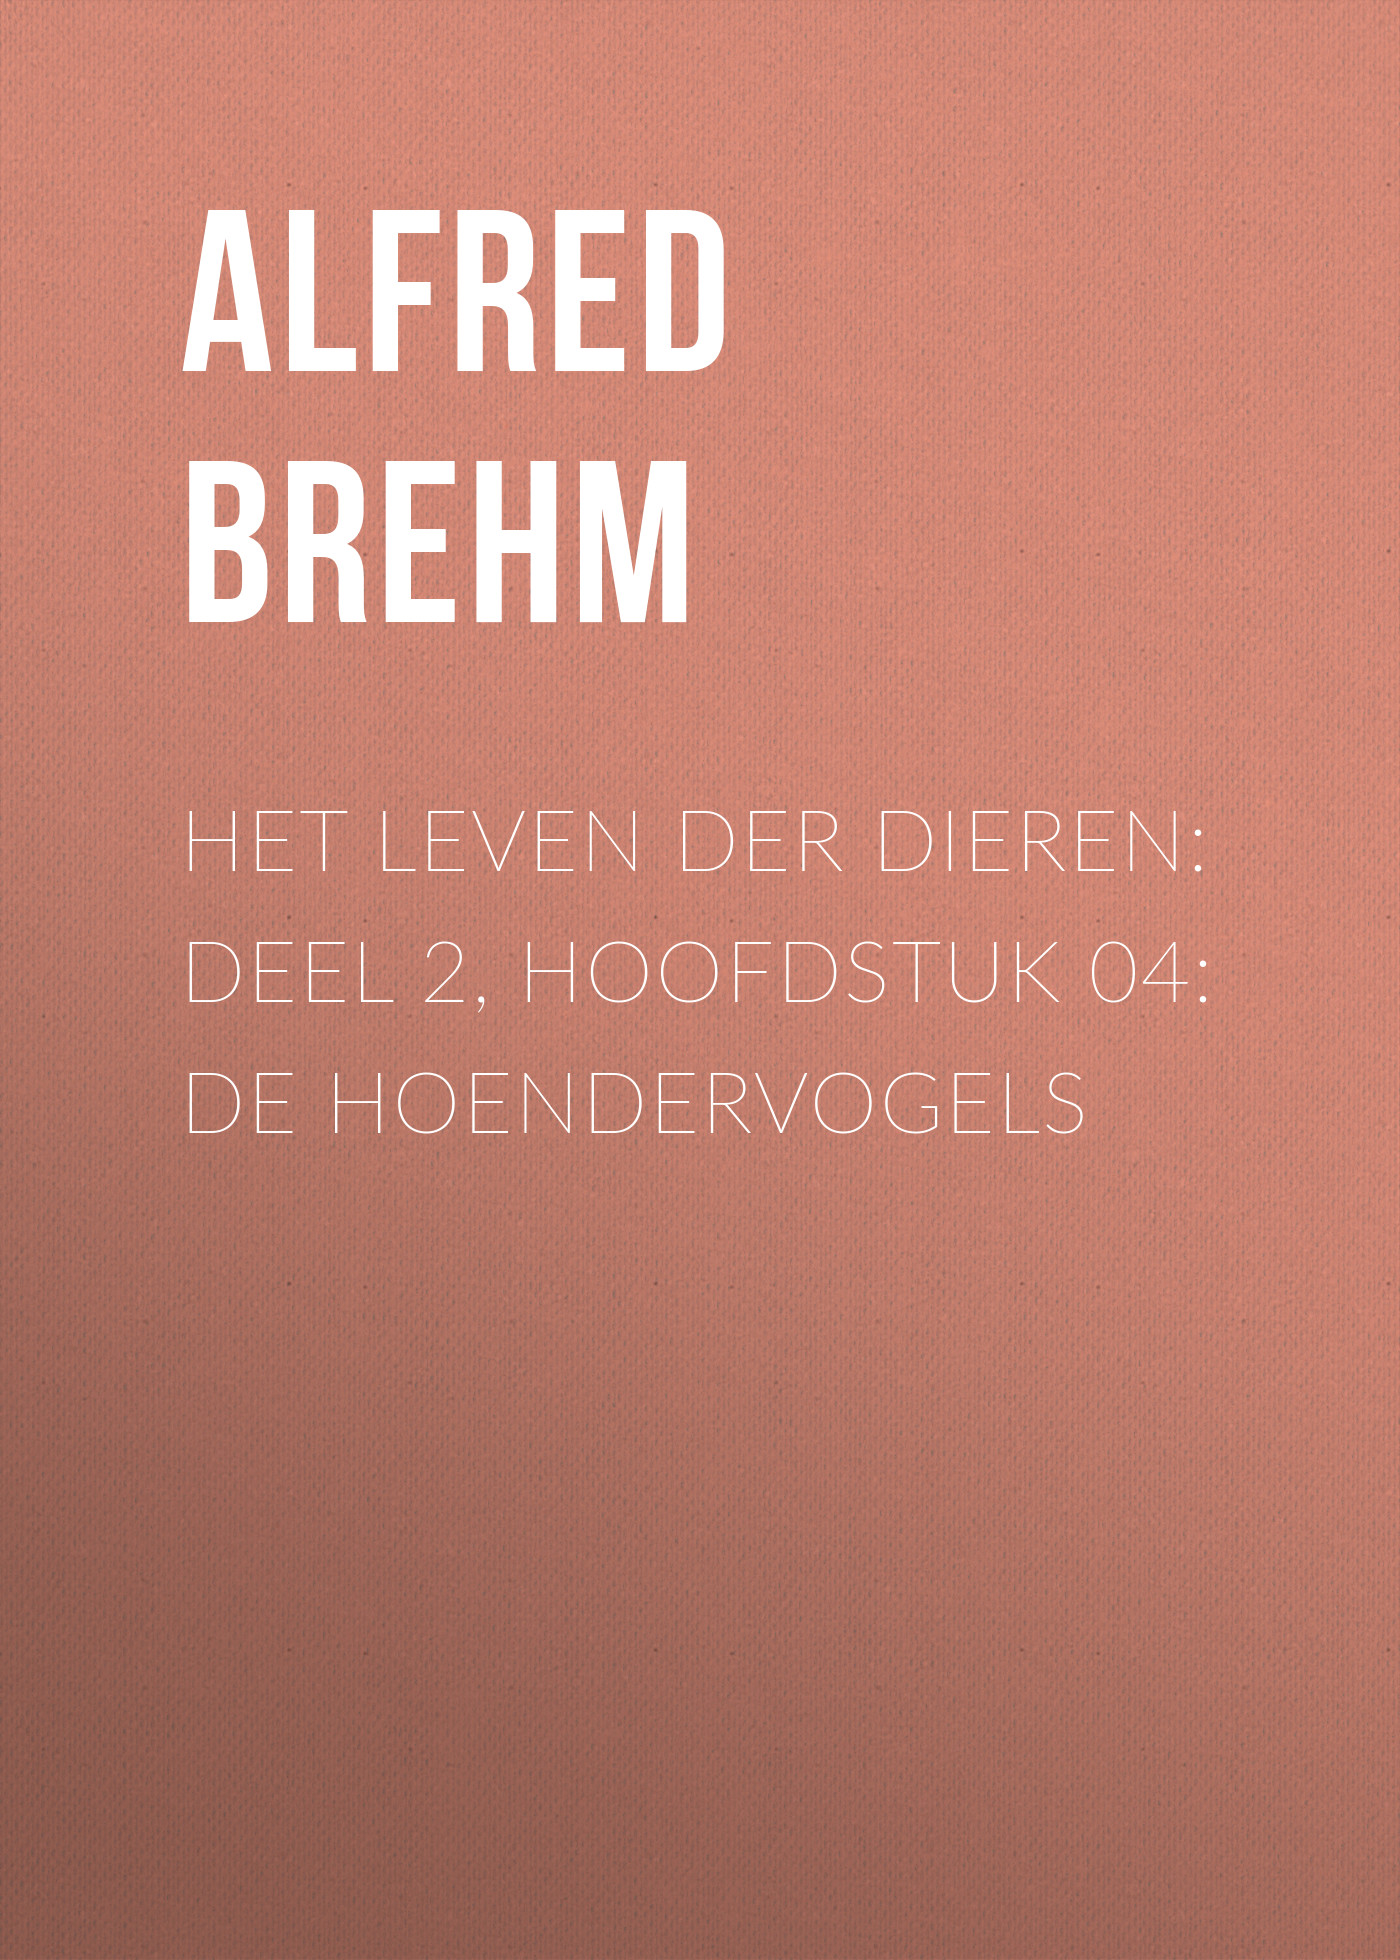 лучшая цена Brehm Alfred Edmund Het Leven der Dieren: Deel 2, Hoofdstuk 04: De Hoendervogels